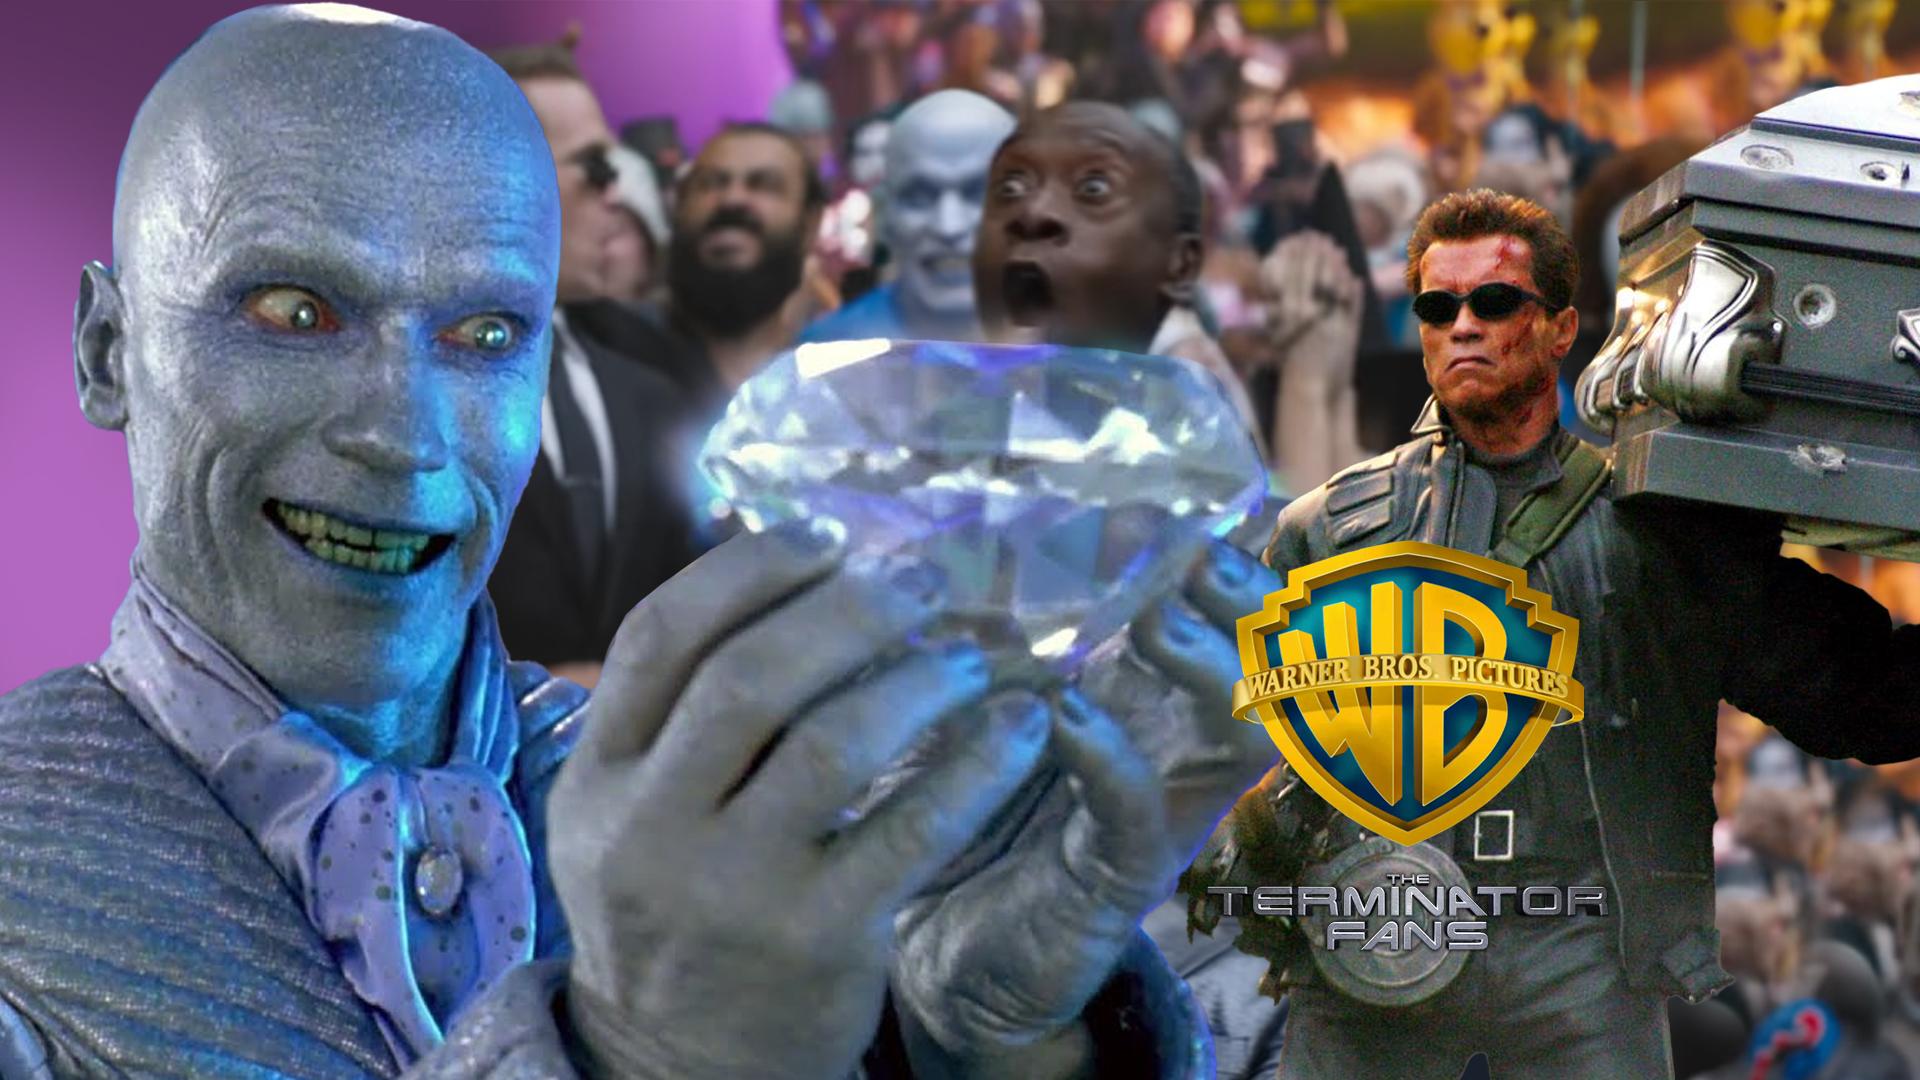 Mr. Freeze Space Jam 2 Terminator Warner Brothers